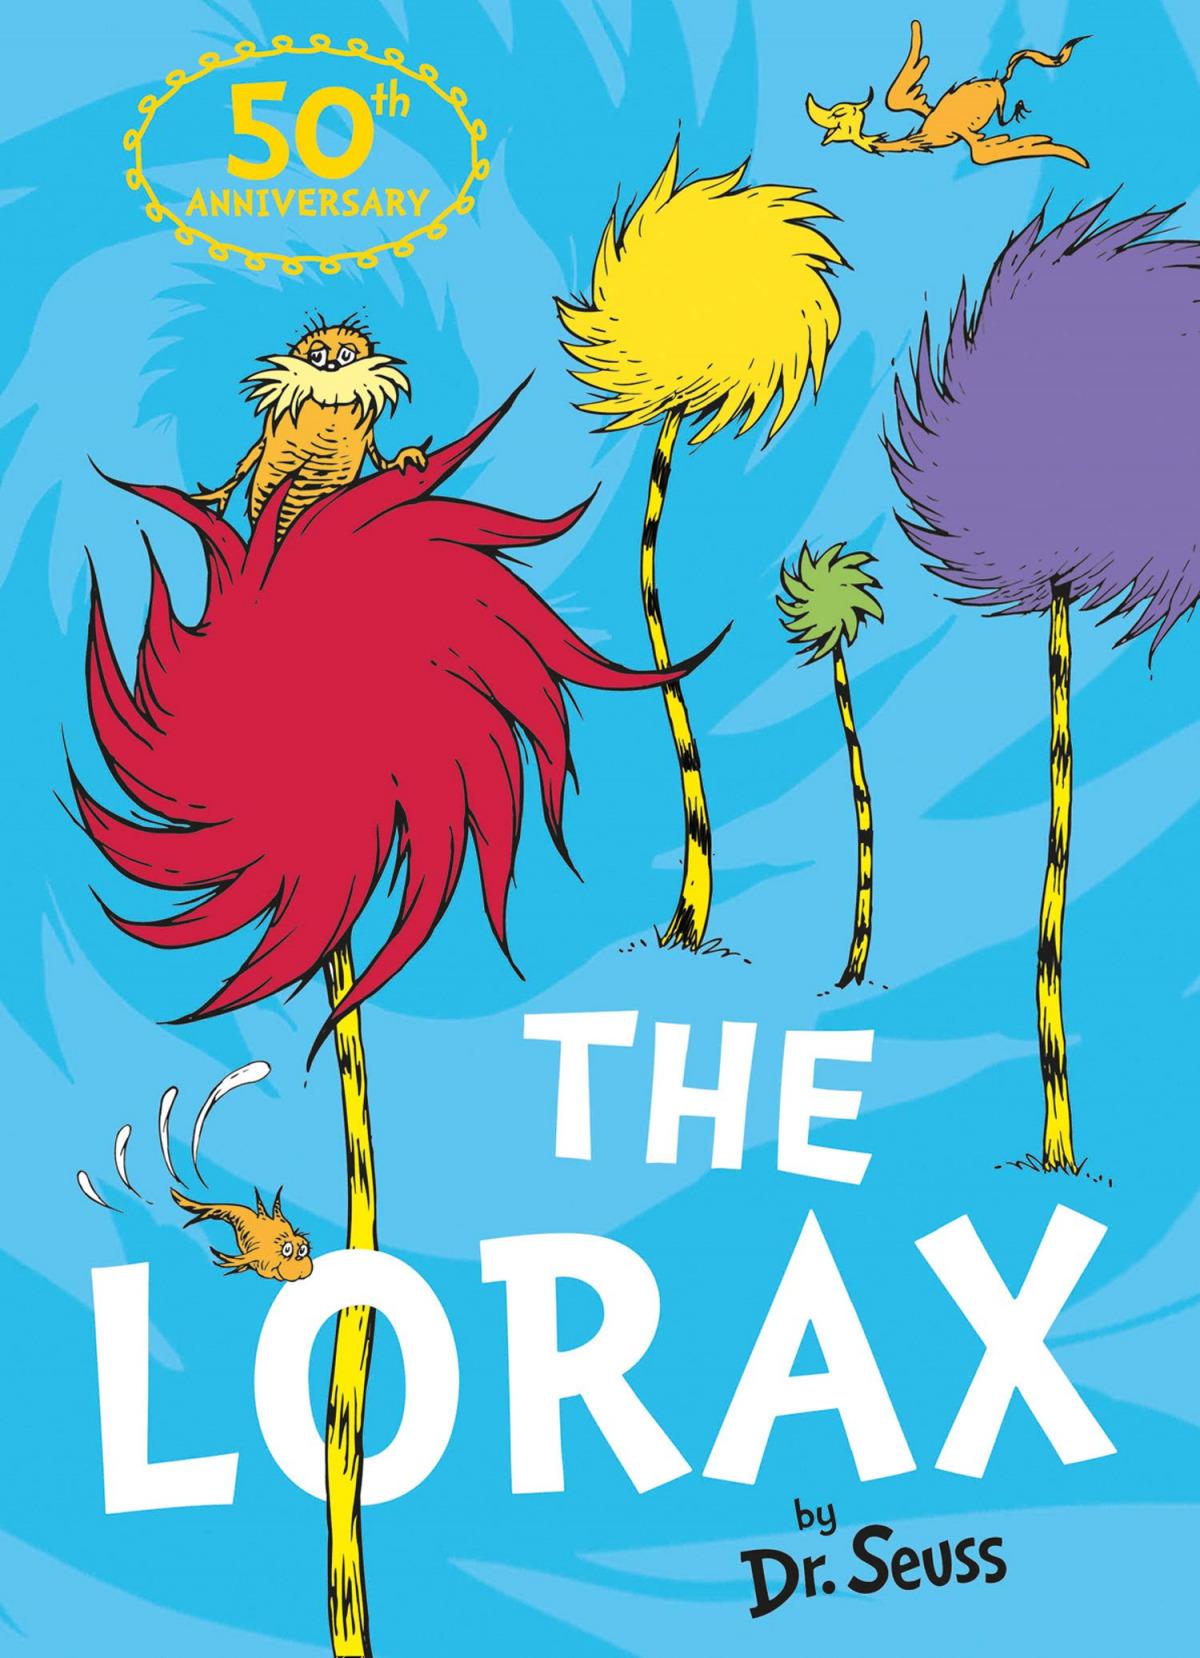 The lorax (harper collins)